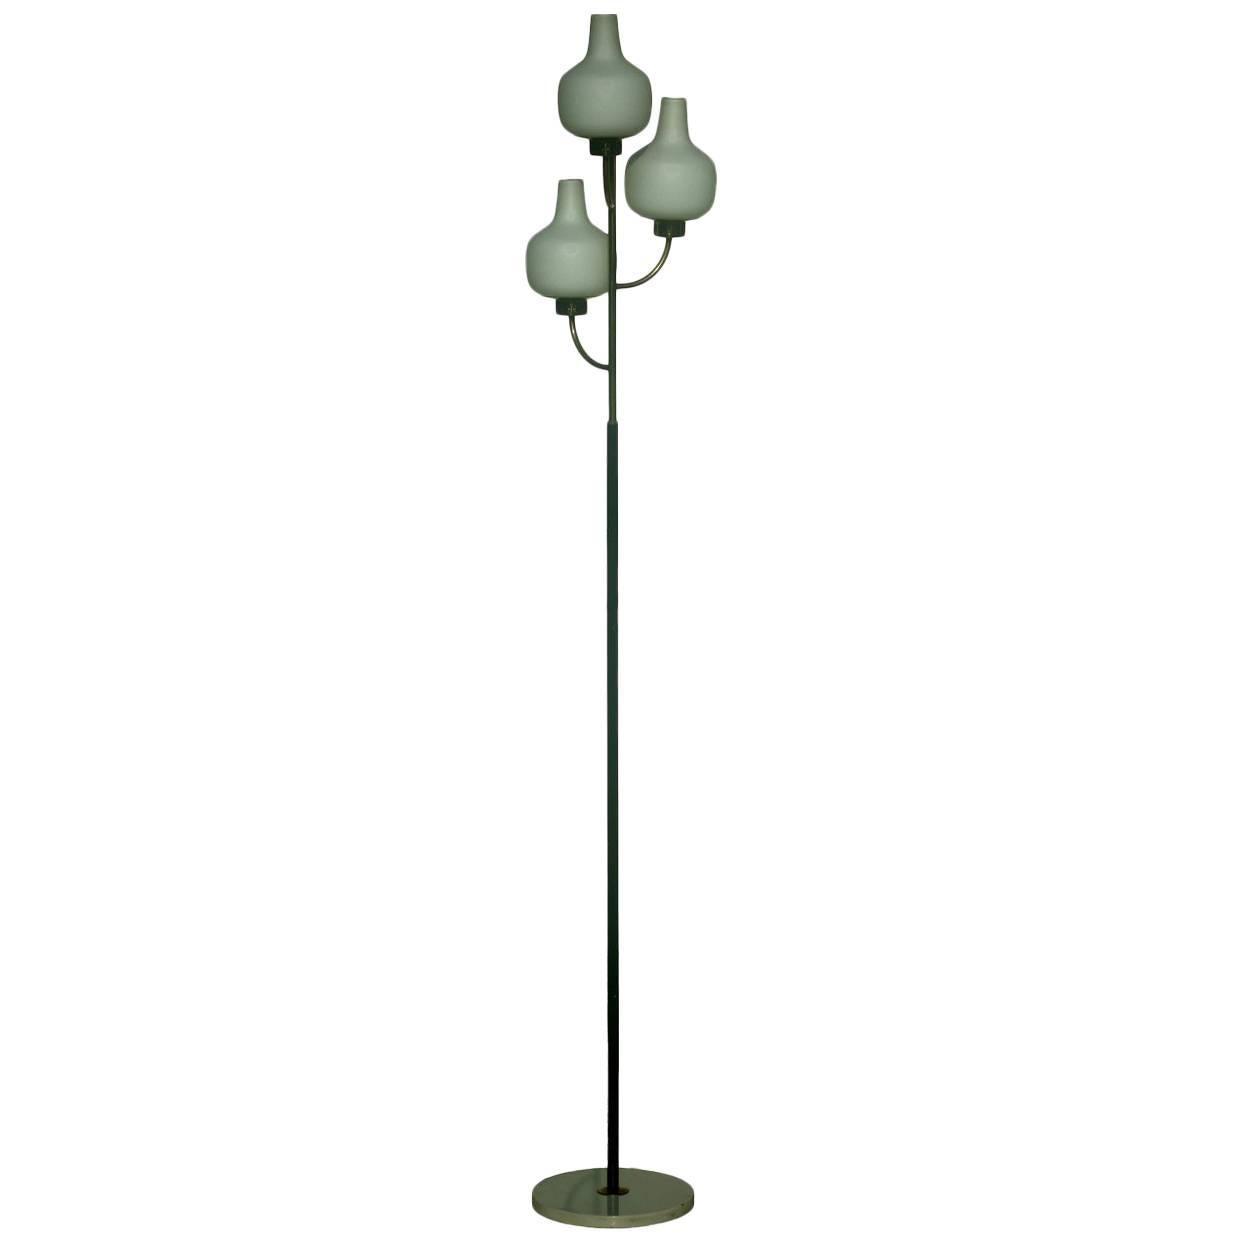 Stilnovo Italian Design Midcentury 1950s Floor Lamp with Label